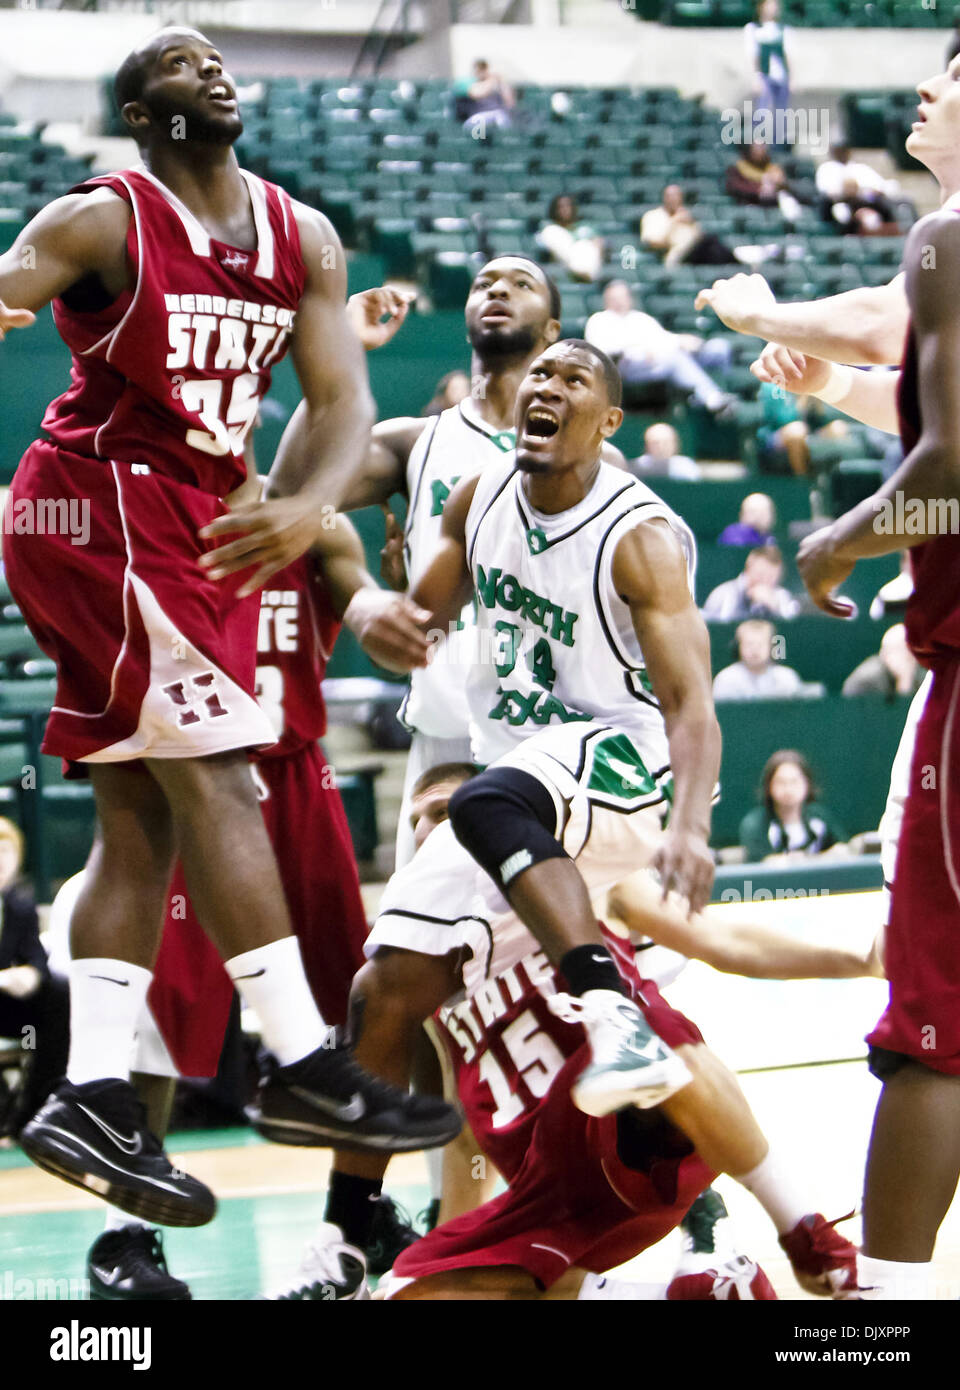 Nov. 12, 2010 - Denton, Texas, United States of America - North Texas Mean Green forward Alonzo Edwards (34) makes - Stock Image